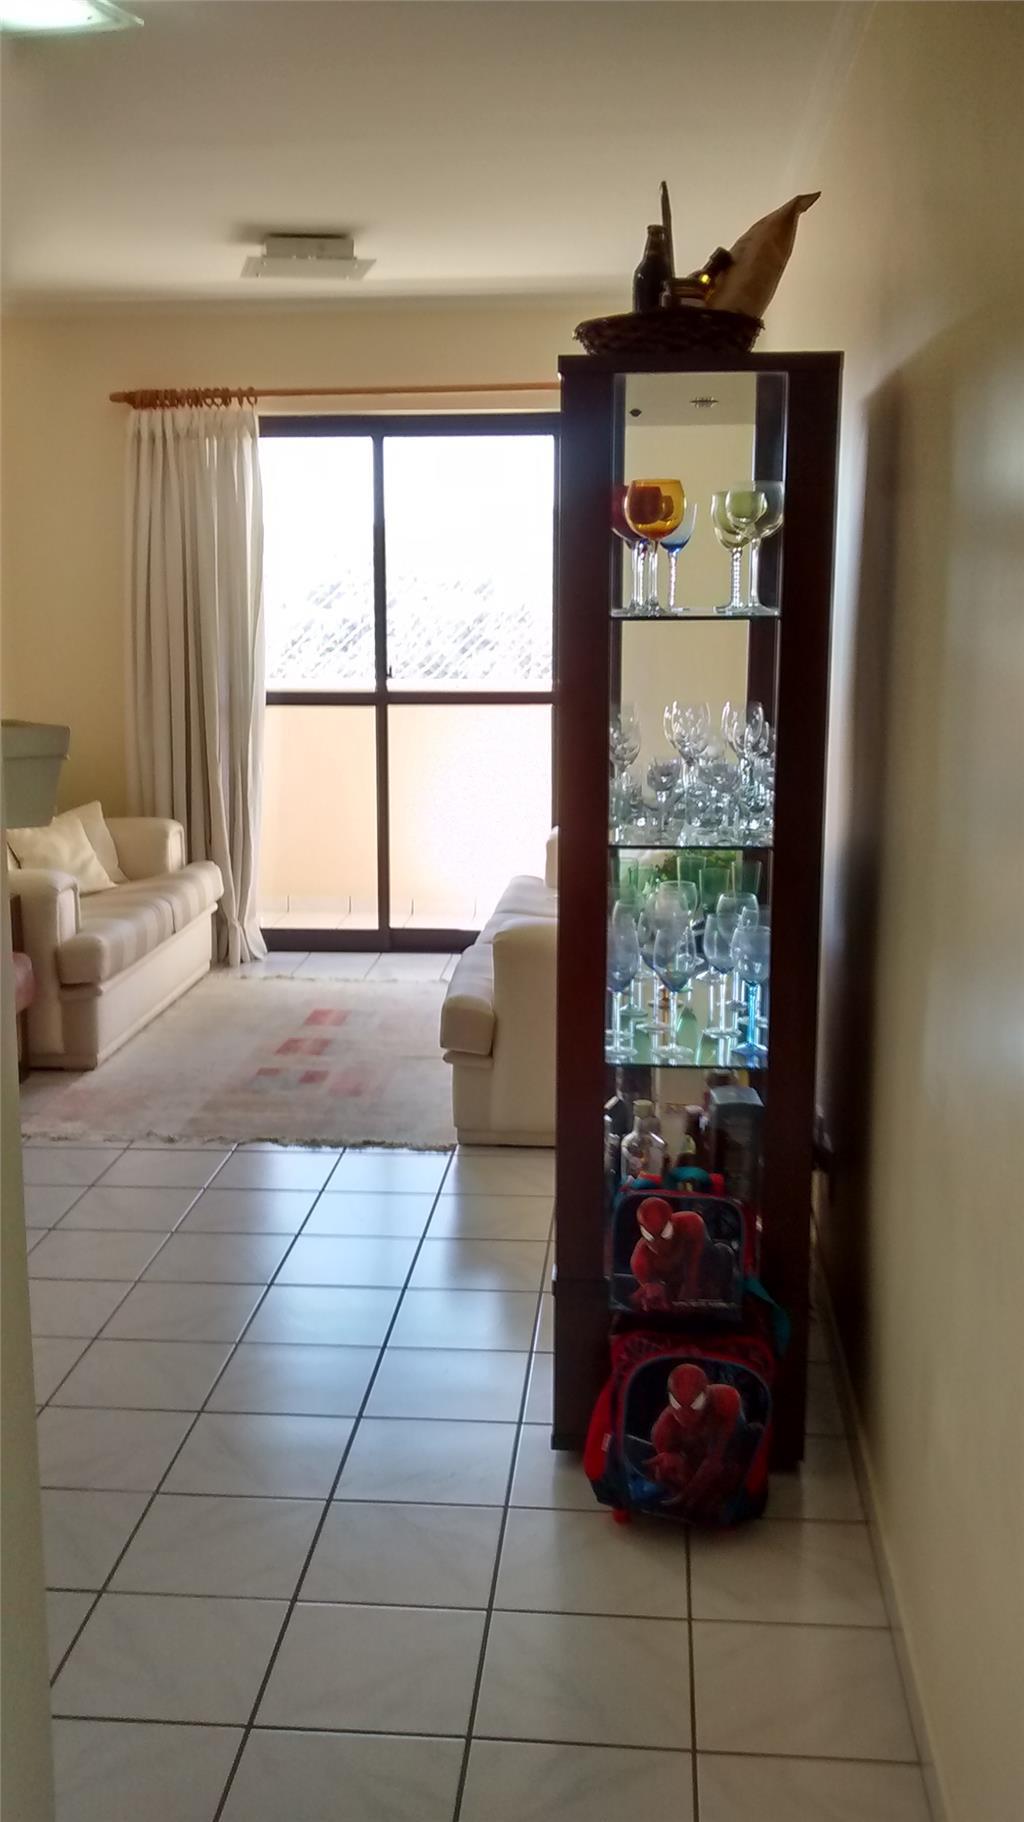 Total Imóveis - Apto 3 Dorm, Eloy Chaves, Jundiaí